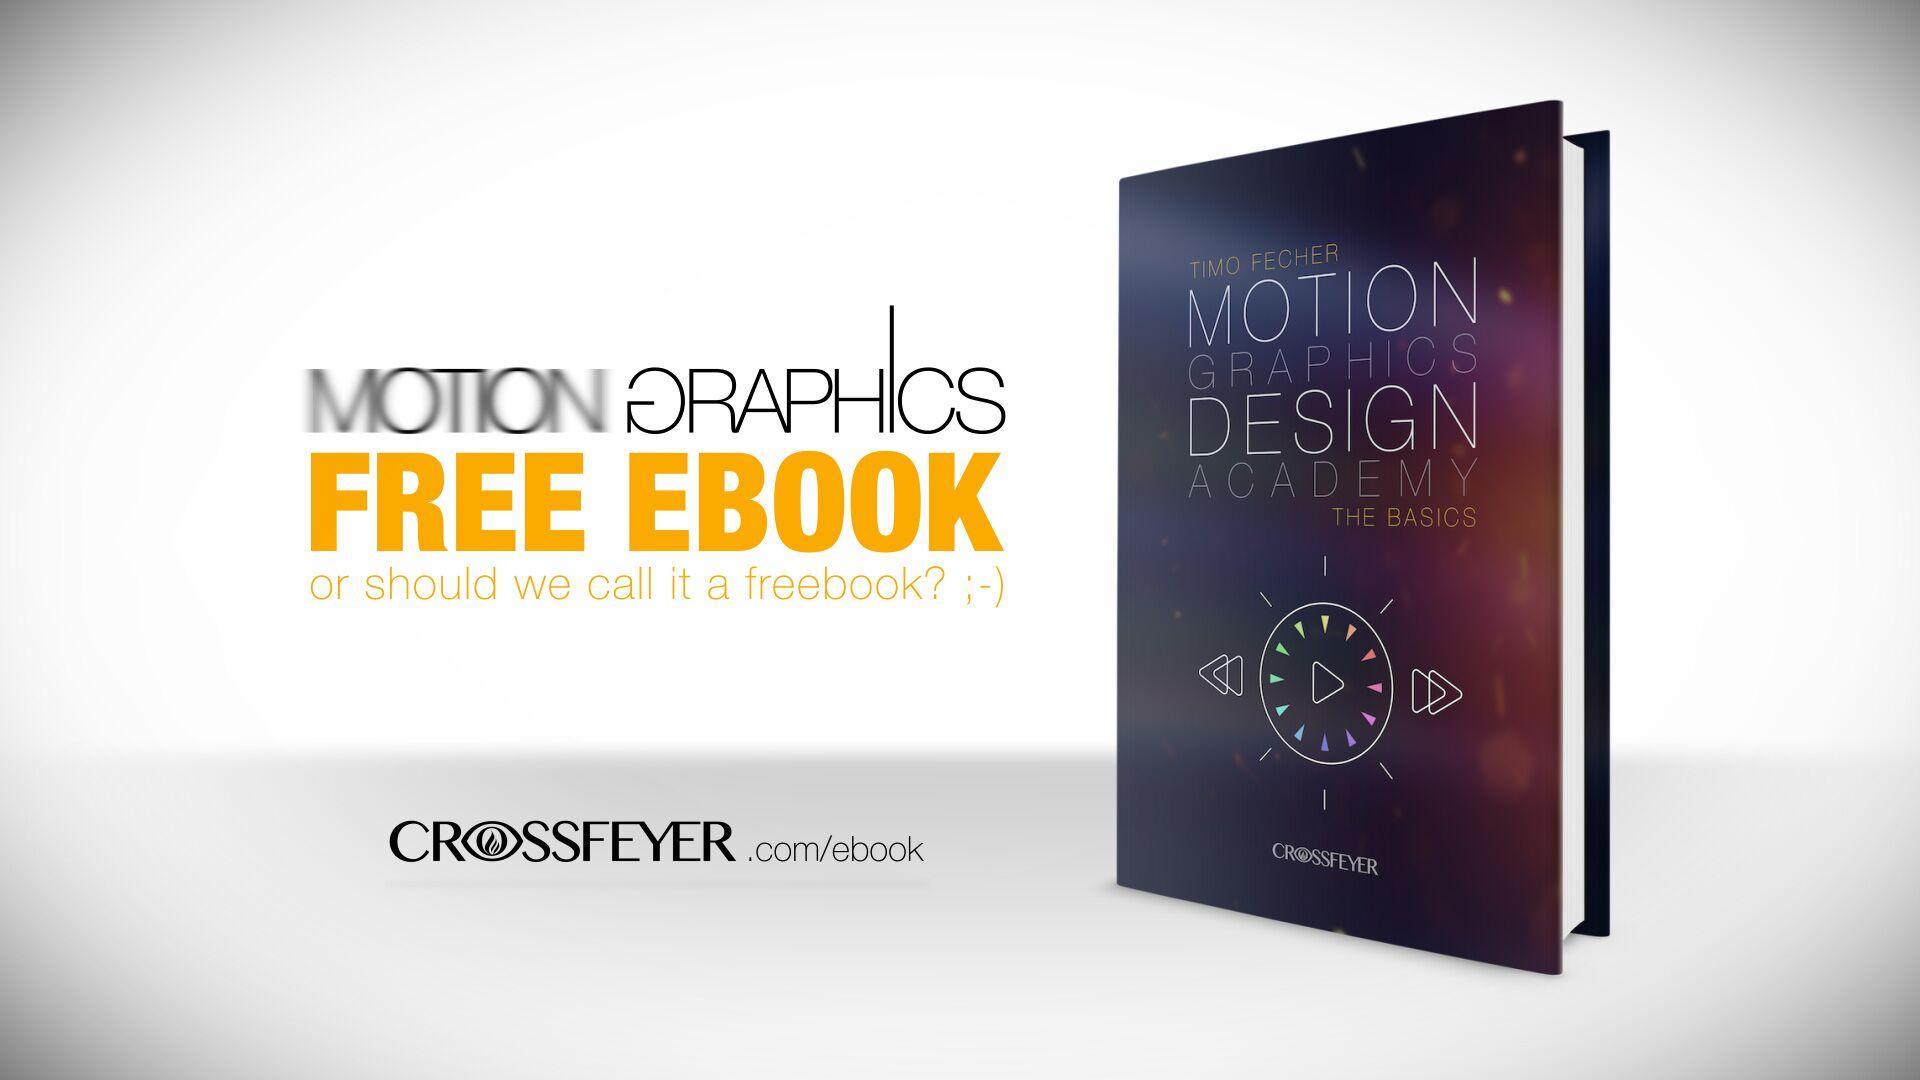 Autodesk 3ds max design 2014 fundamentals ebook array free motion graphics ebook motion graphics design academy from rh toolfarm com fandeluxe Choice Image